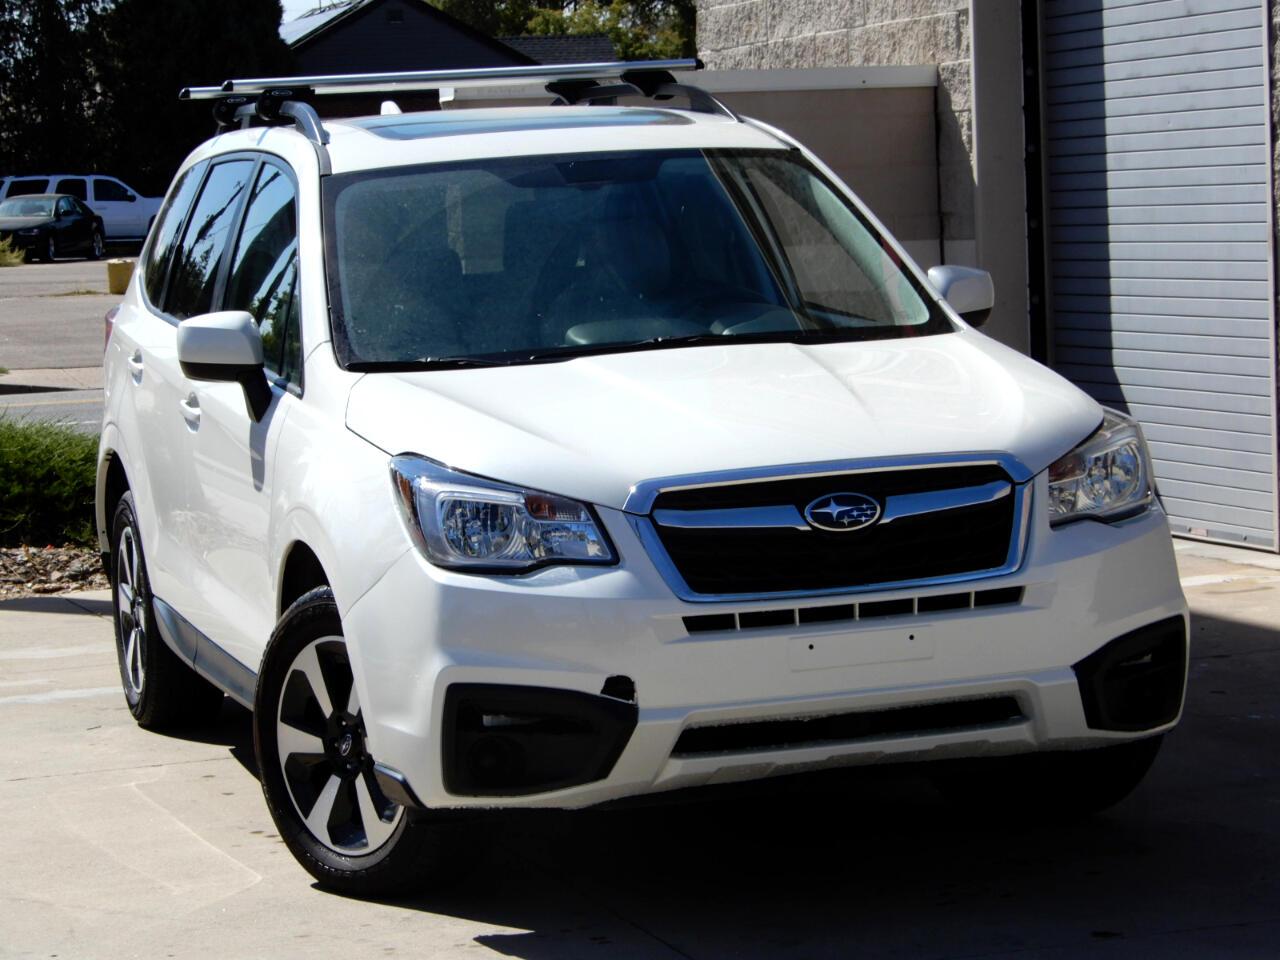 Subaru Forester 2.5i Premium CVT 2017